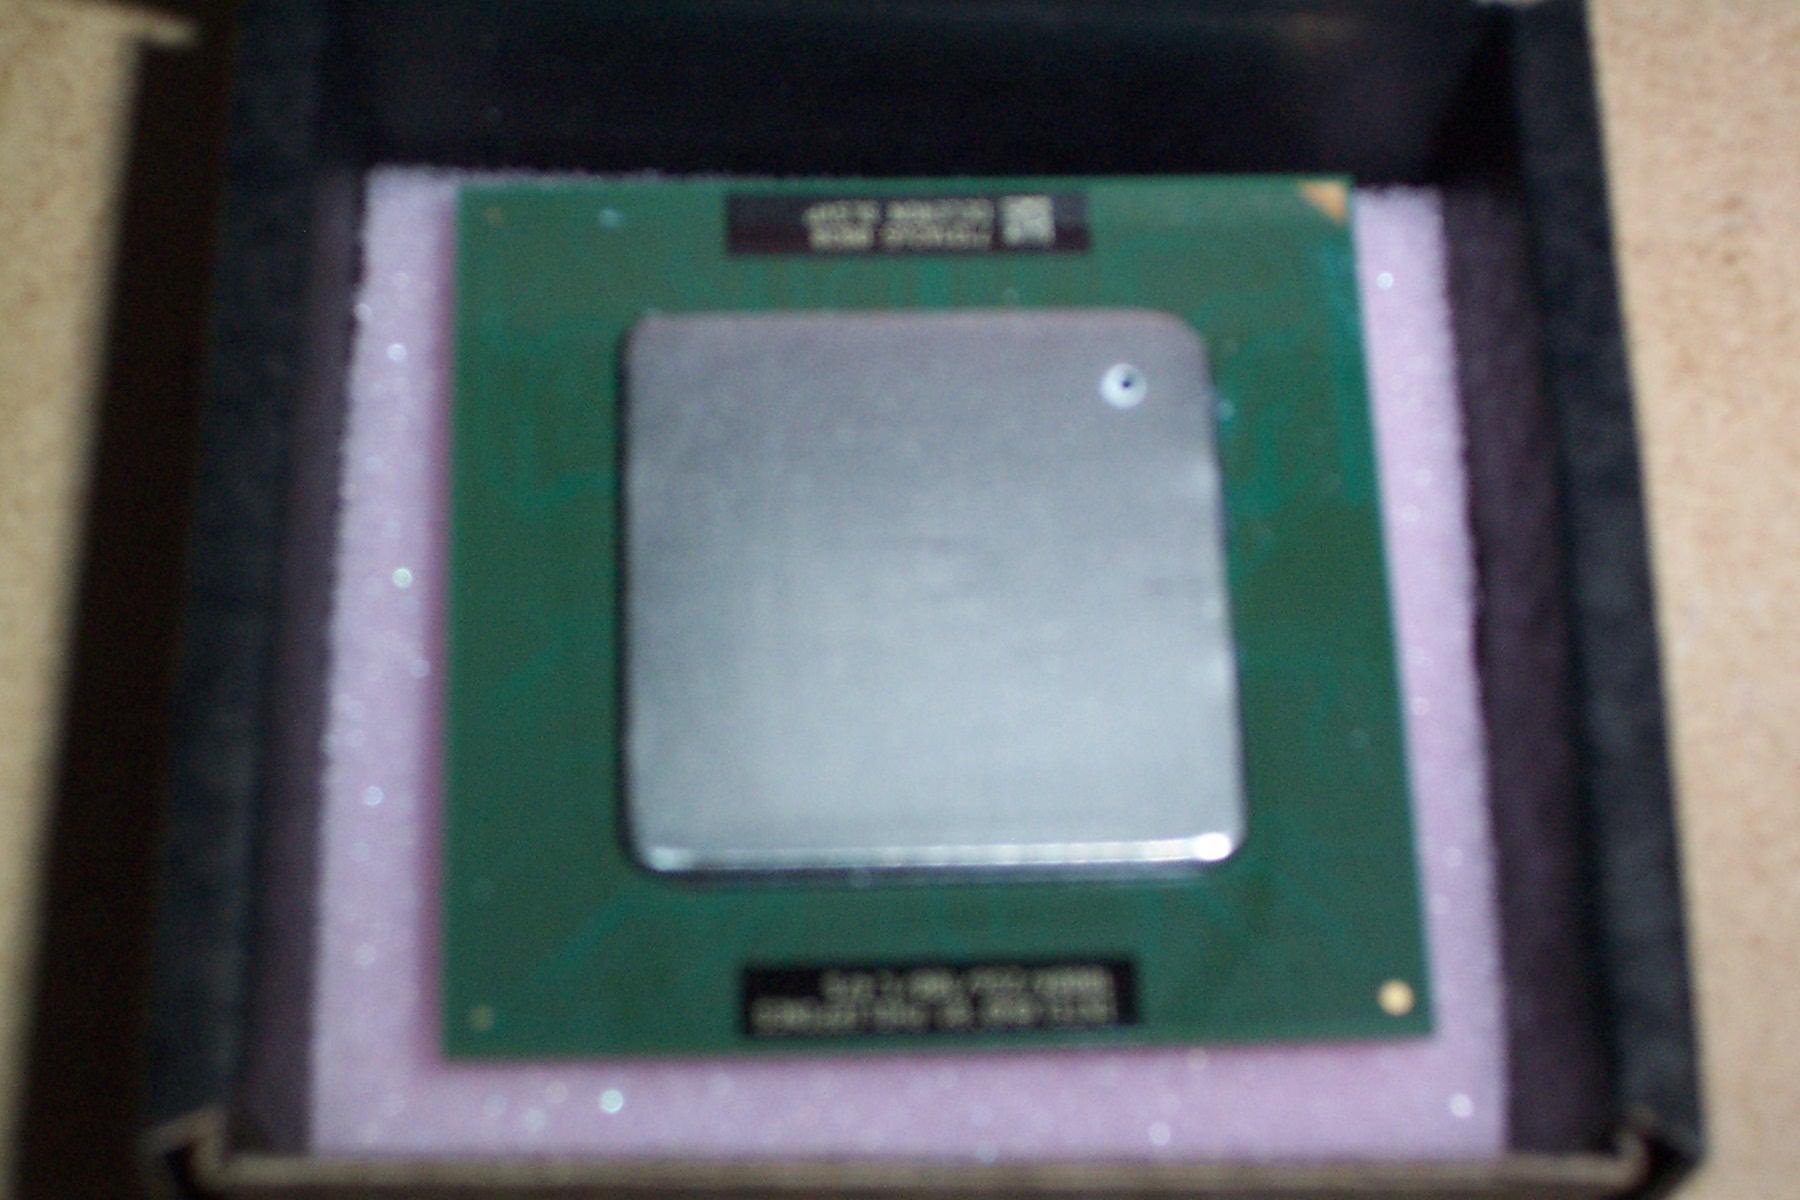 Intel SL5VP Celeron 1000A Socket 370 Processor - 100MHz Bus Speed, 256KB L2